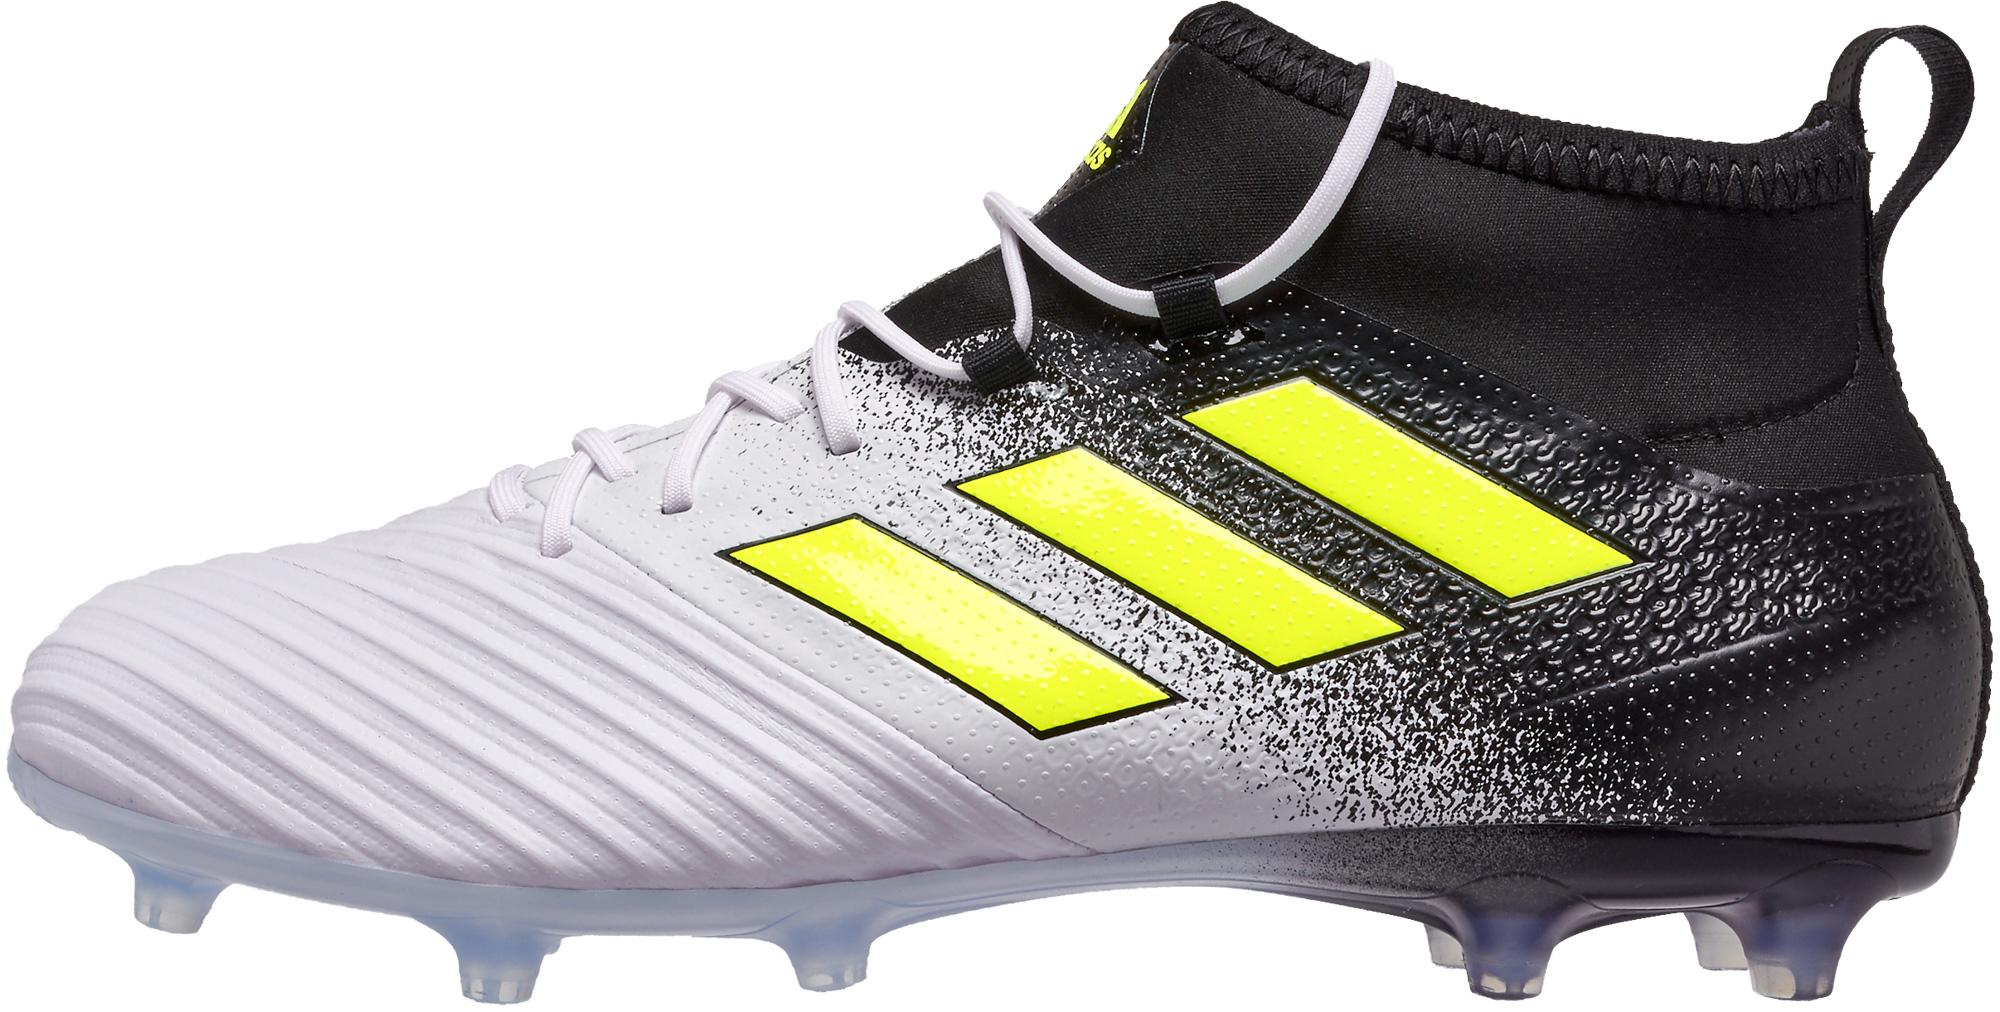 buy popular 81dd7 6a0cc adidas ACE 17.2 FG Soccer Cleats - White & Solar Yellow ...